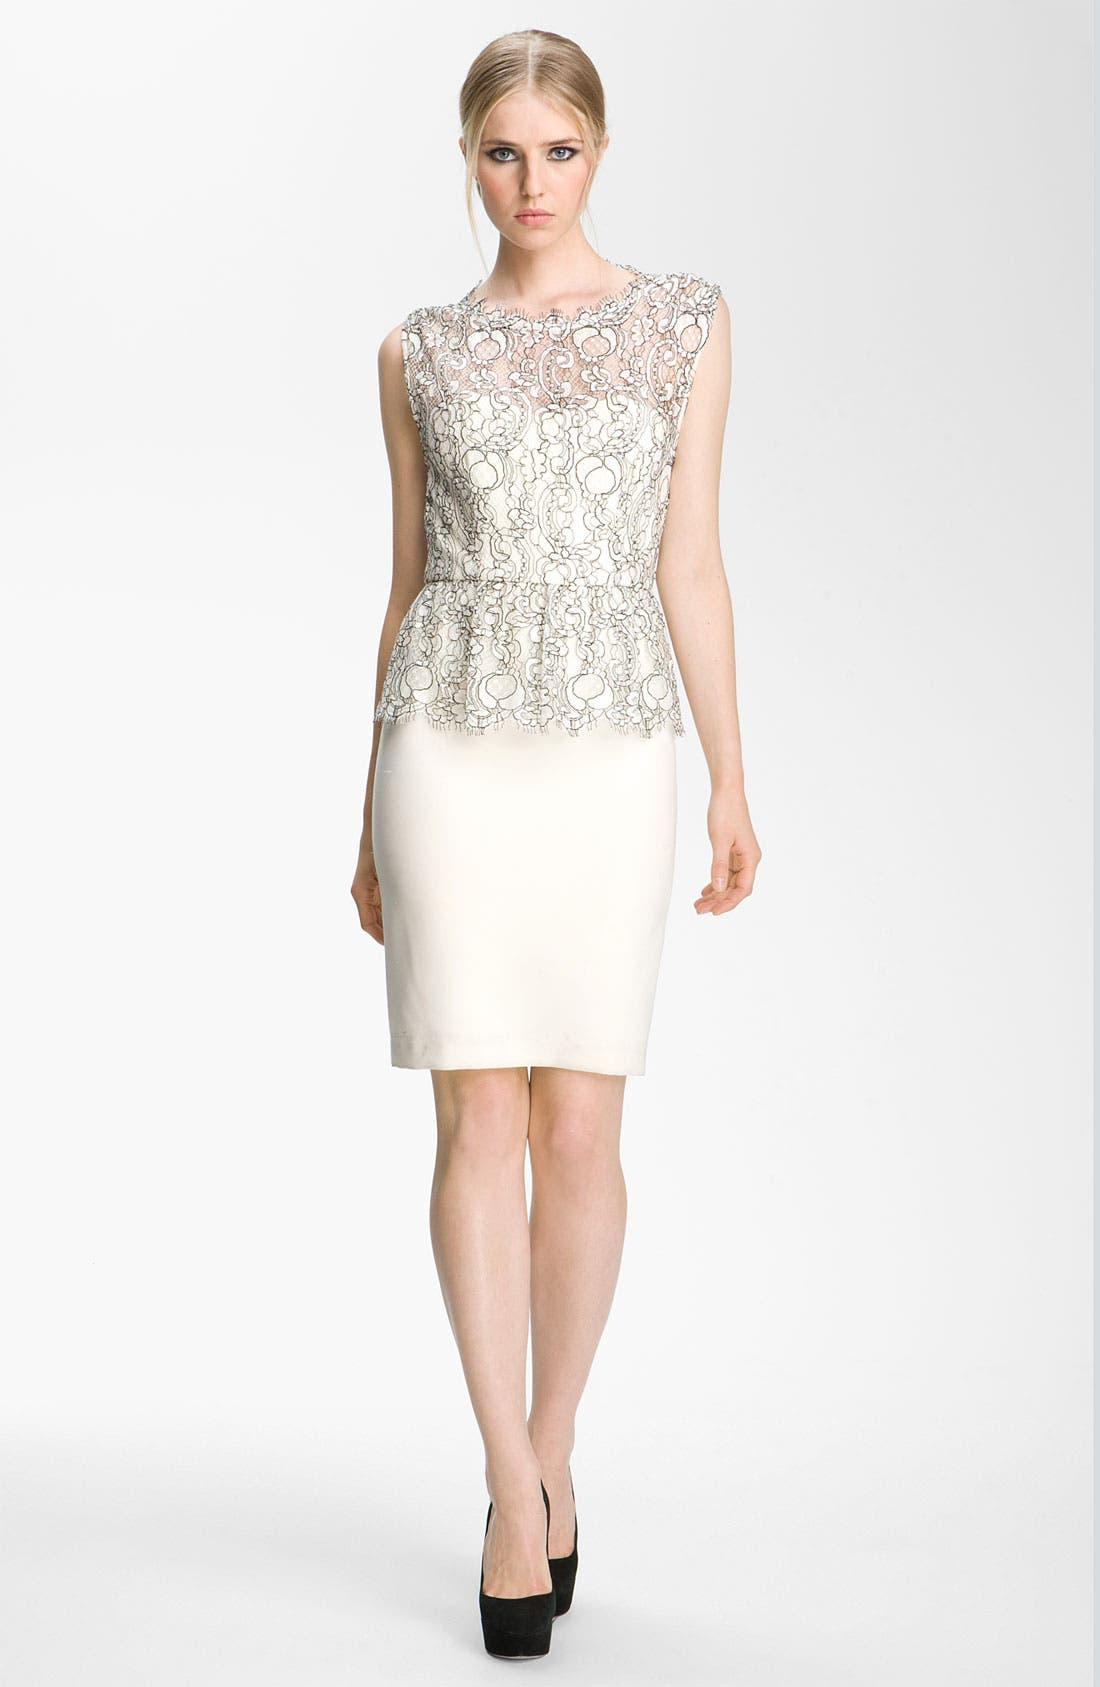 Main Image - Alice + Olivia 'Shovan' Lace Overlay Peplum Dress